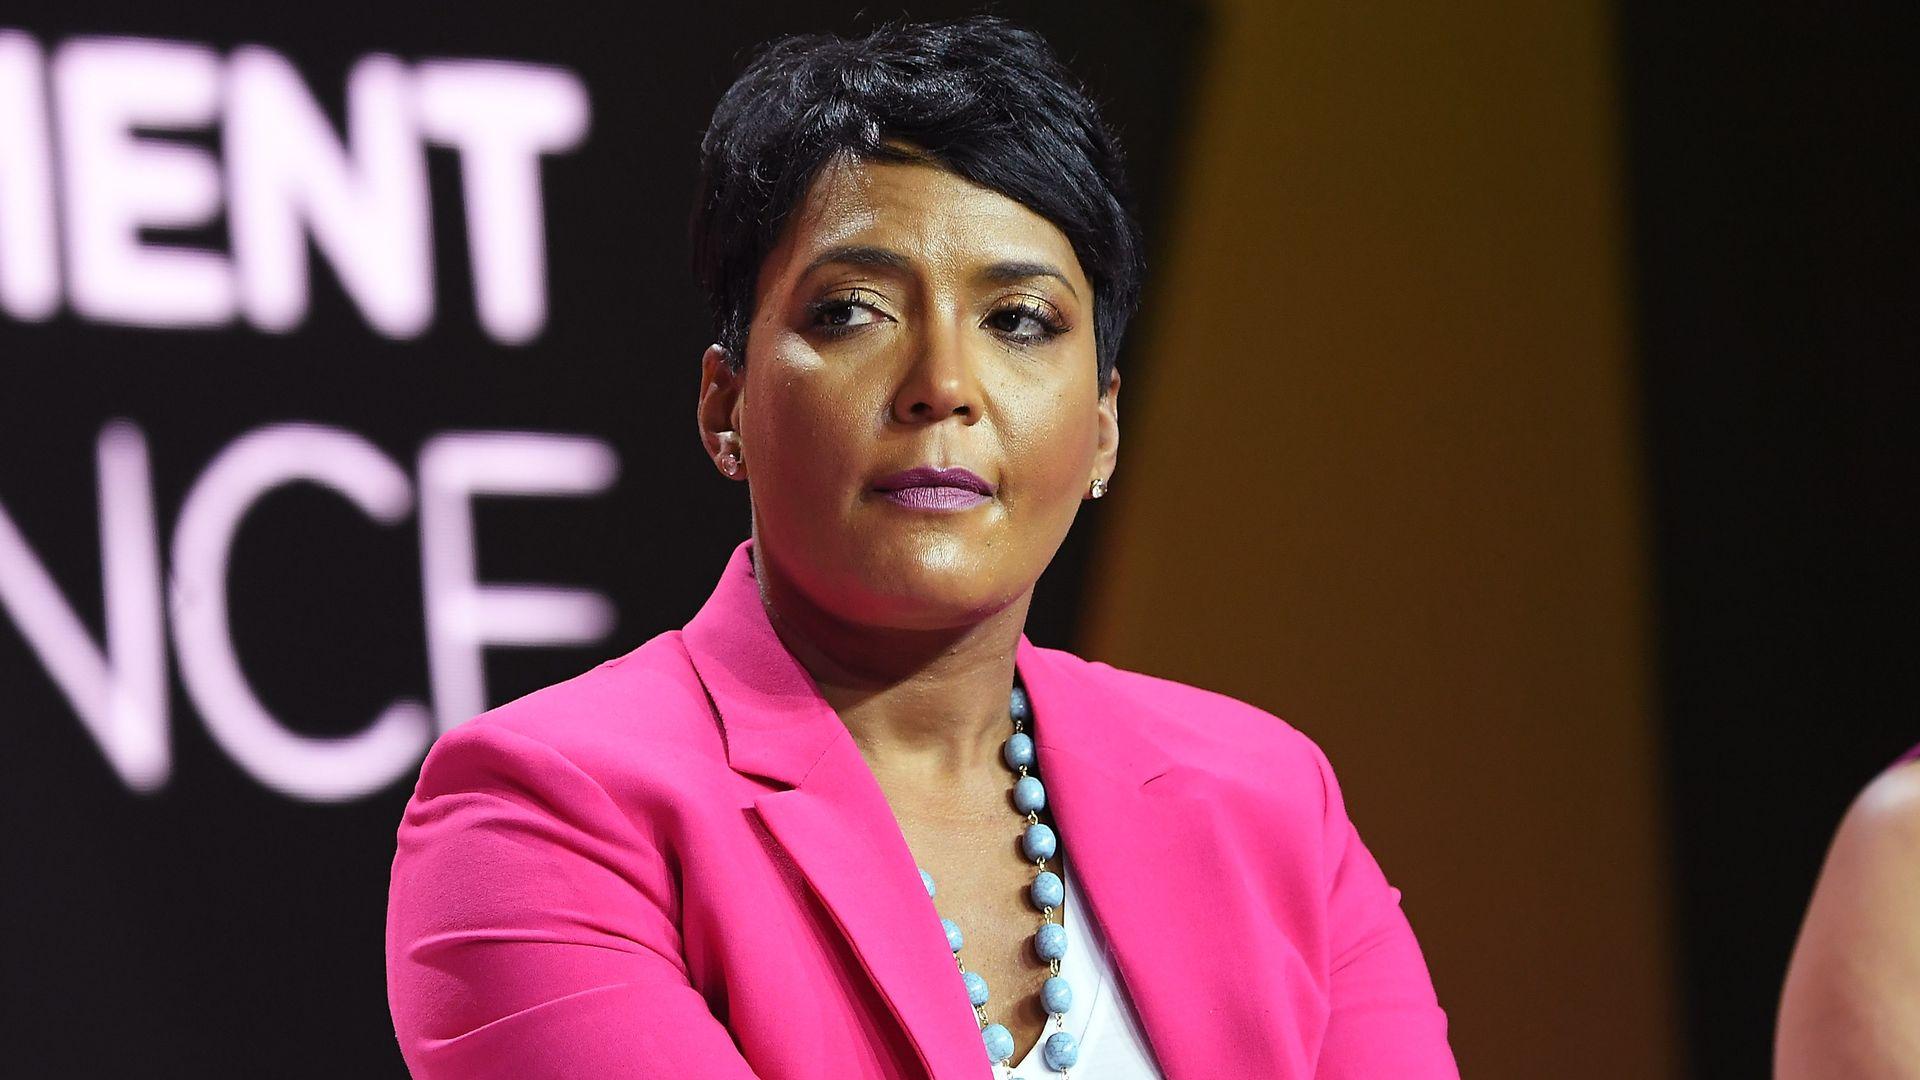 Atlanta Mayor Keisha Lance Bottoms will not run for re-election - Axios